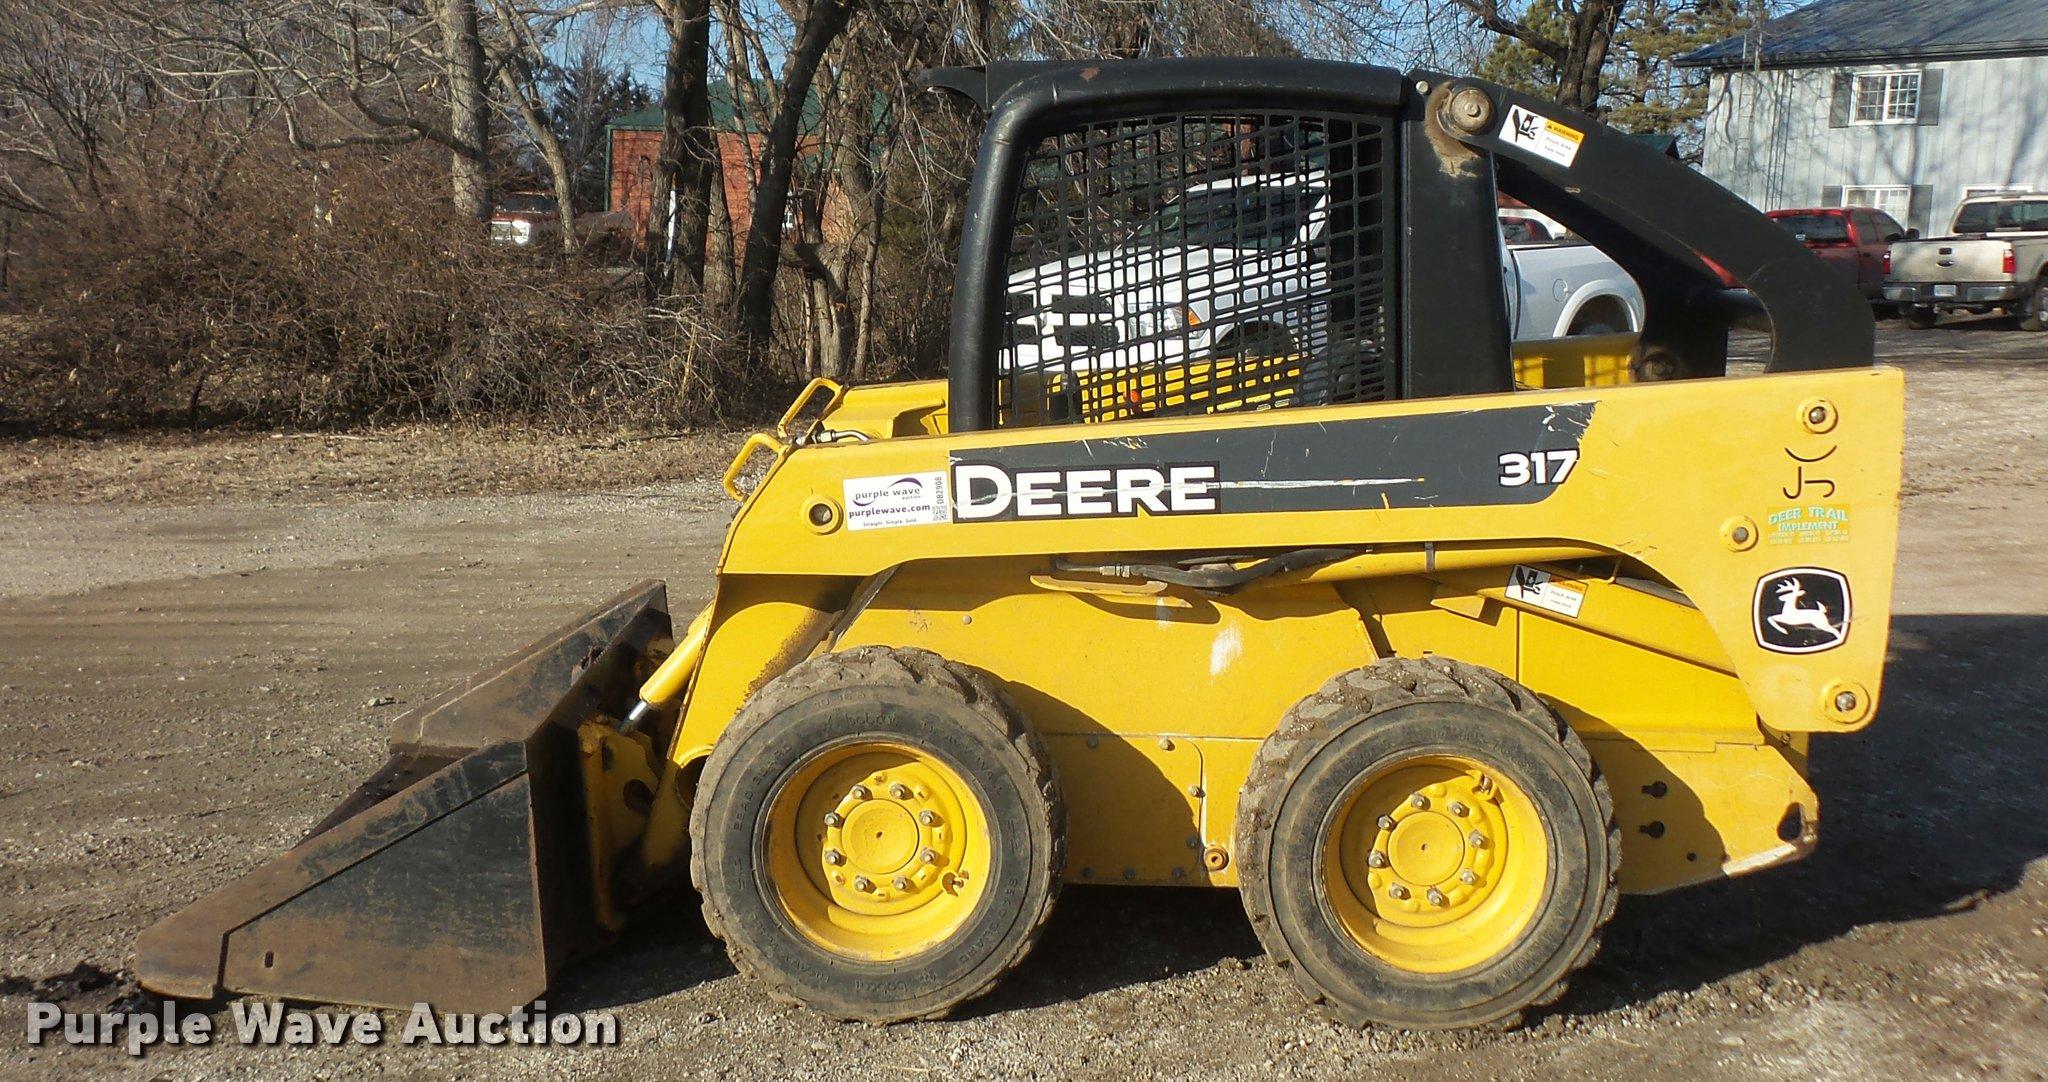 2006 John Deere 317 skid steer | Item DB2908 | SOLD! Februar